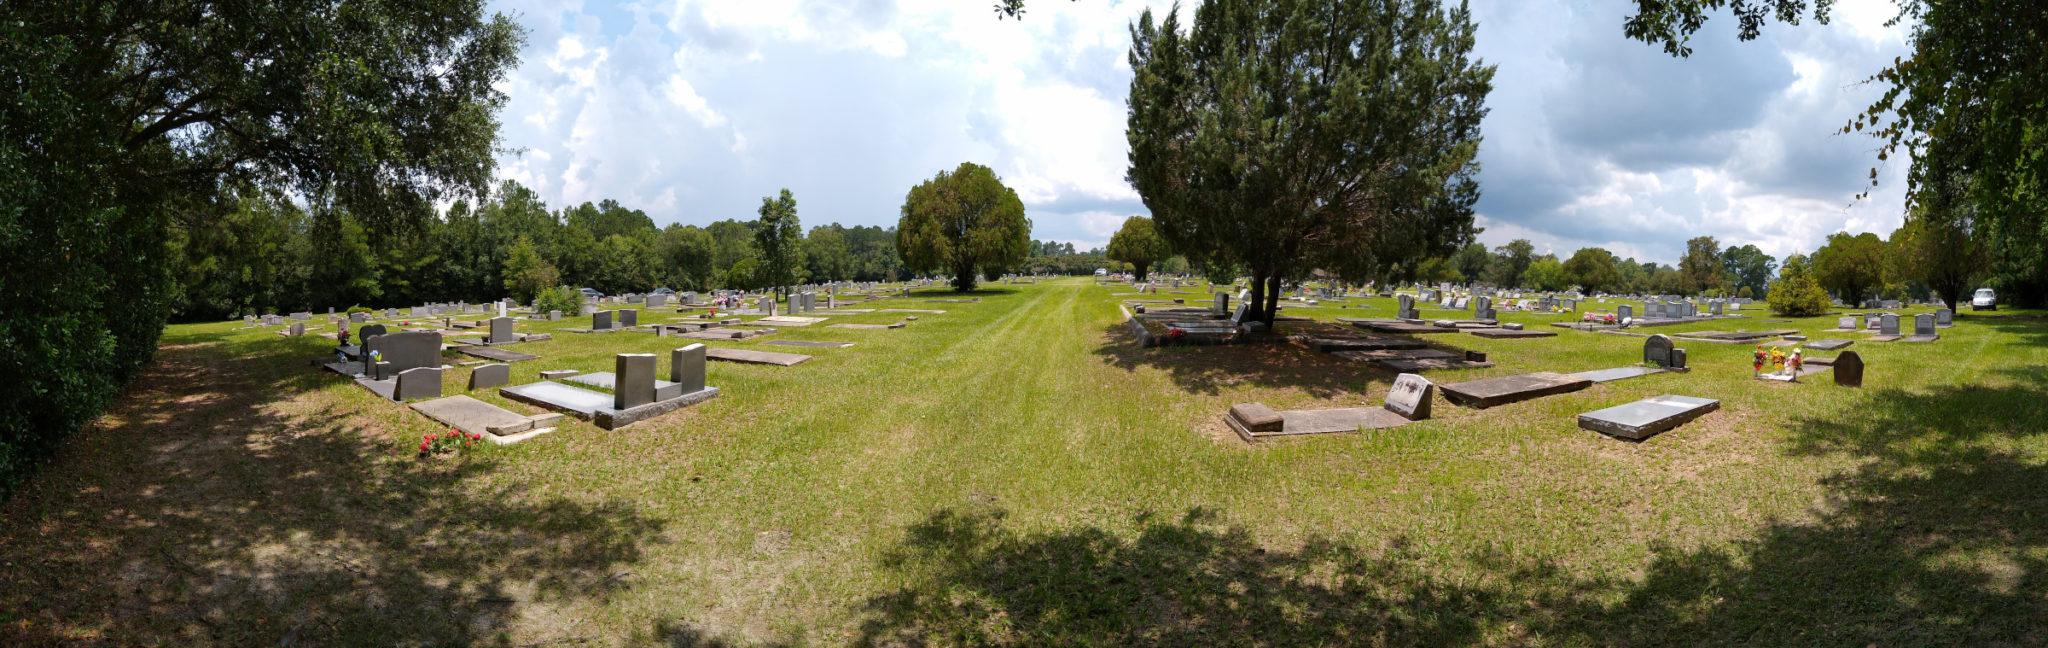 Hazzard Hill Cemetery, Waycross, Georgia